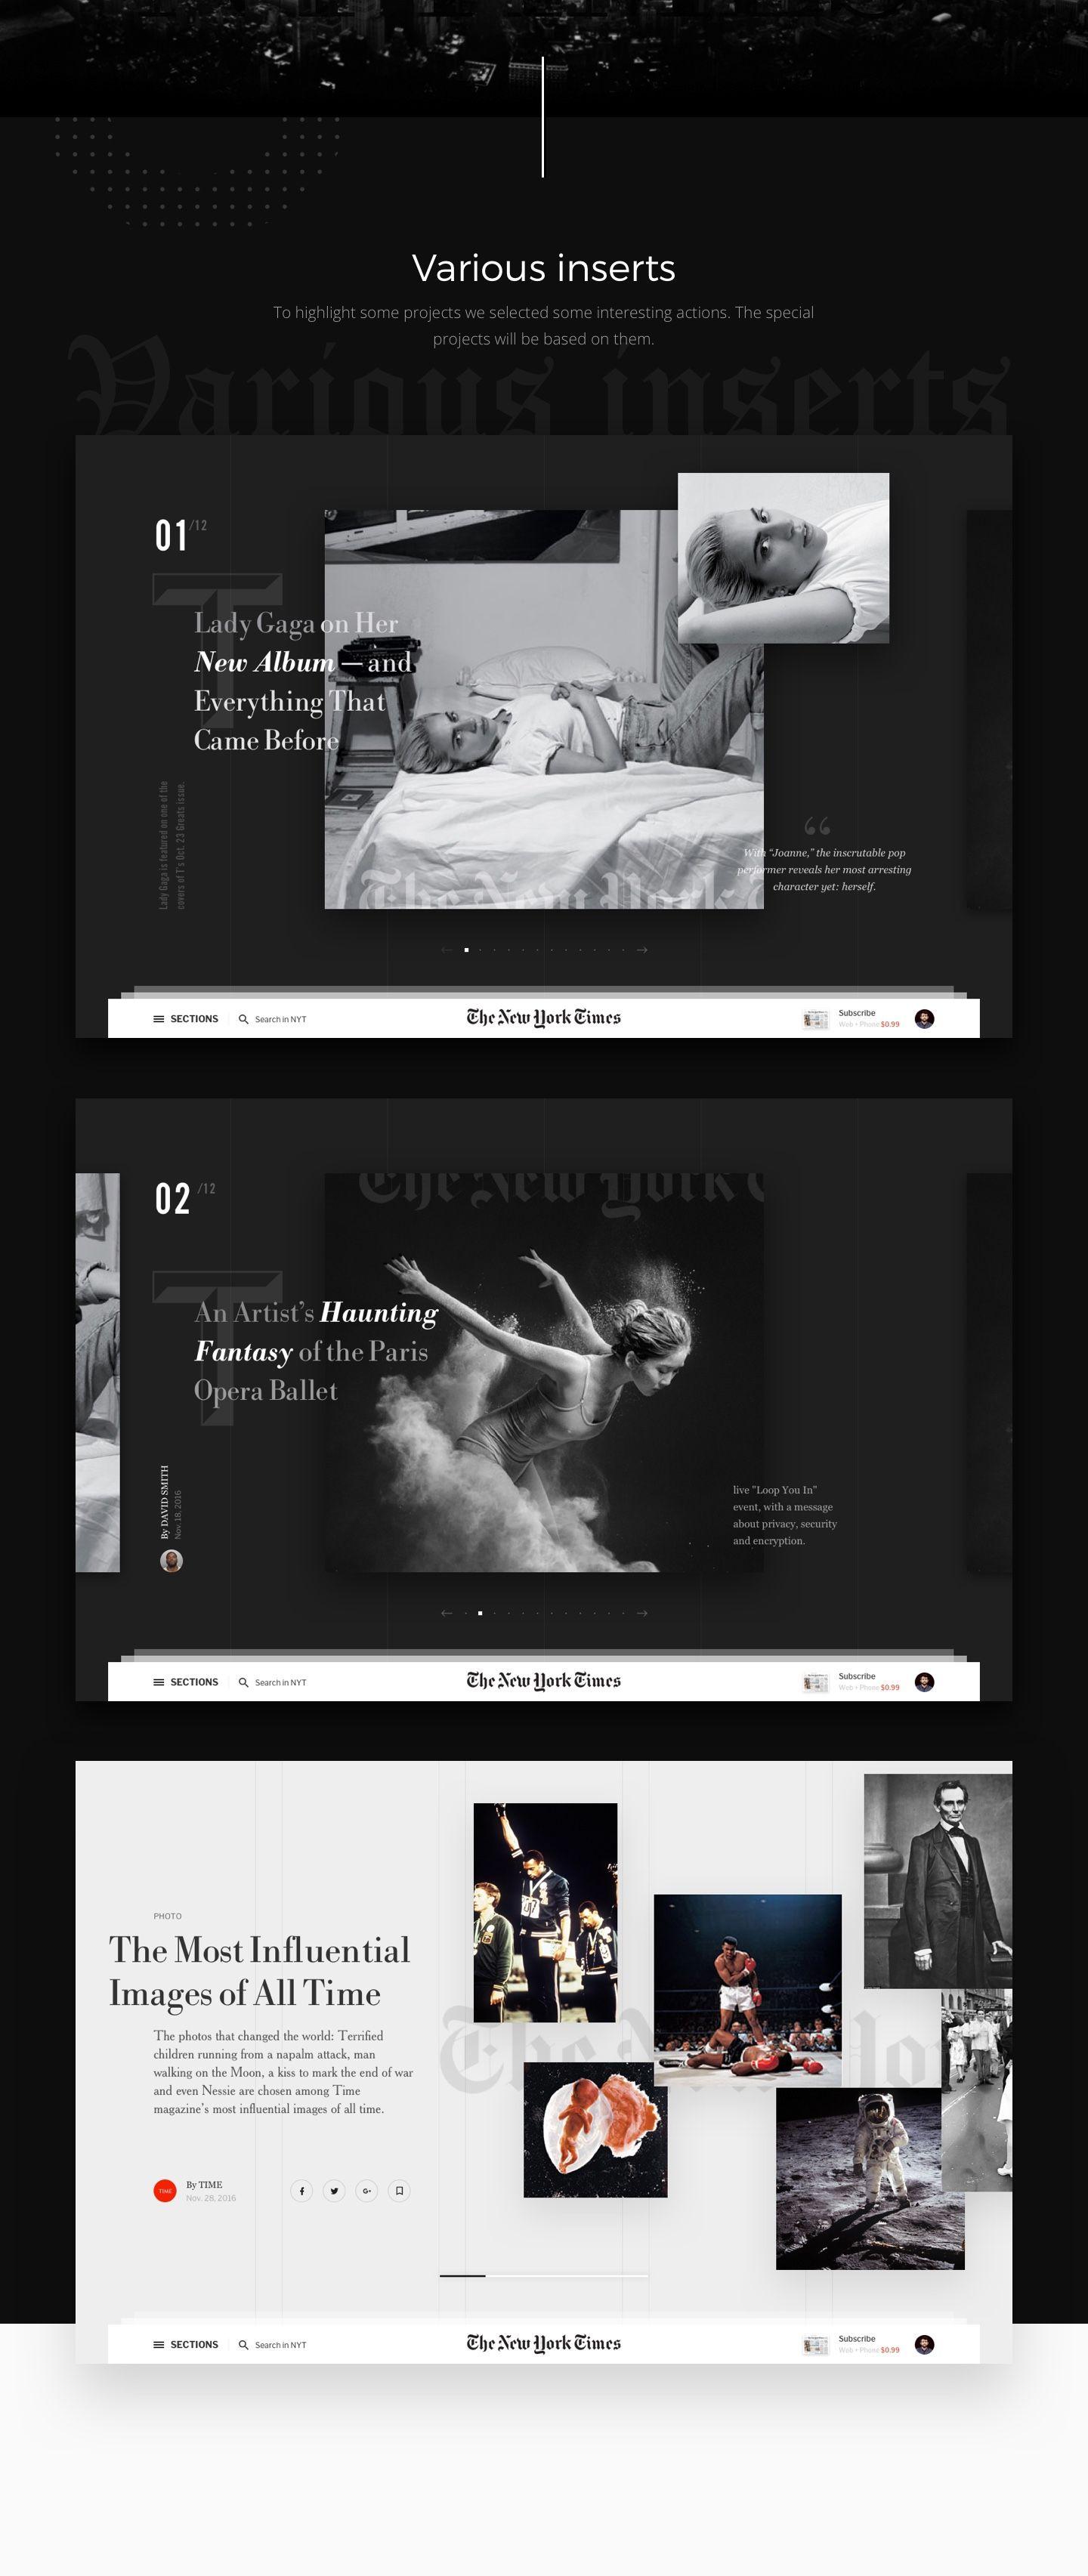 Editorial Design The New York Times Redesign Concept Web Design Websites Web Development Design Web Design Services